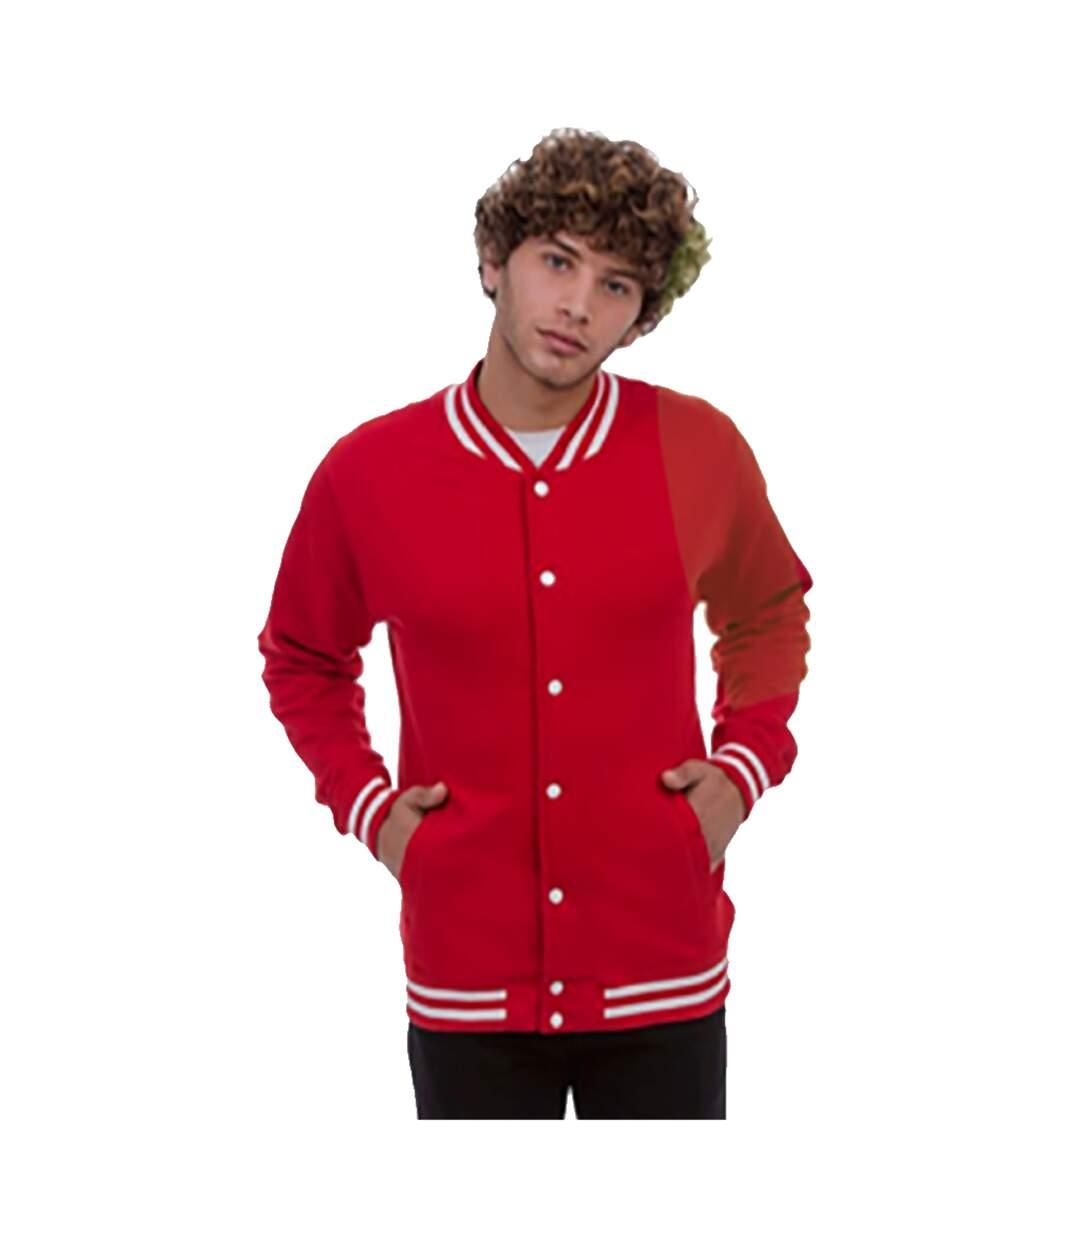 Awdis Adults Unisex College Varsity Jacket (Fire Red) - UTRW174